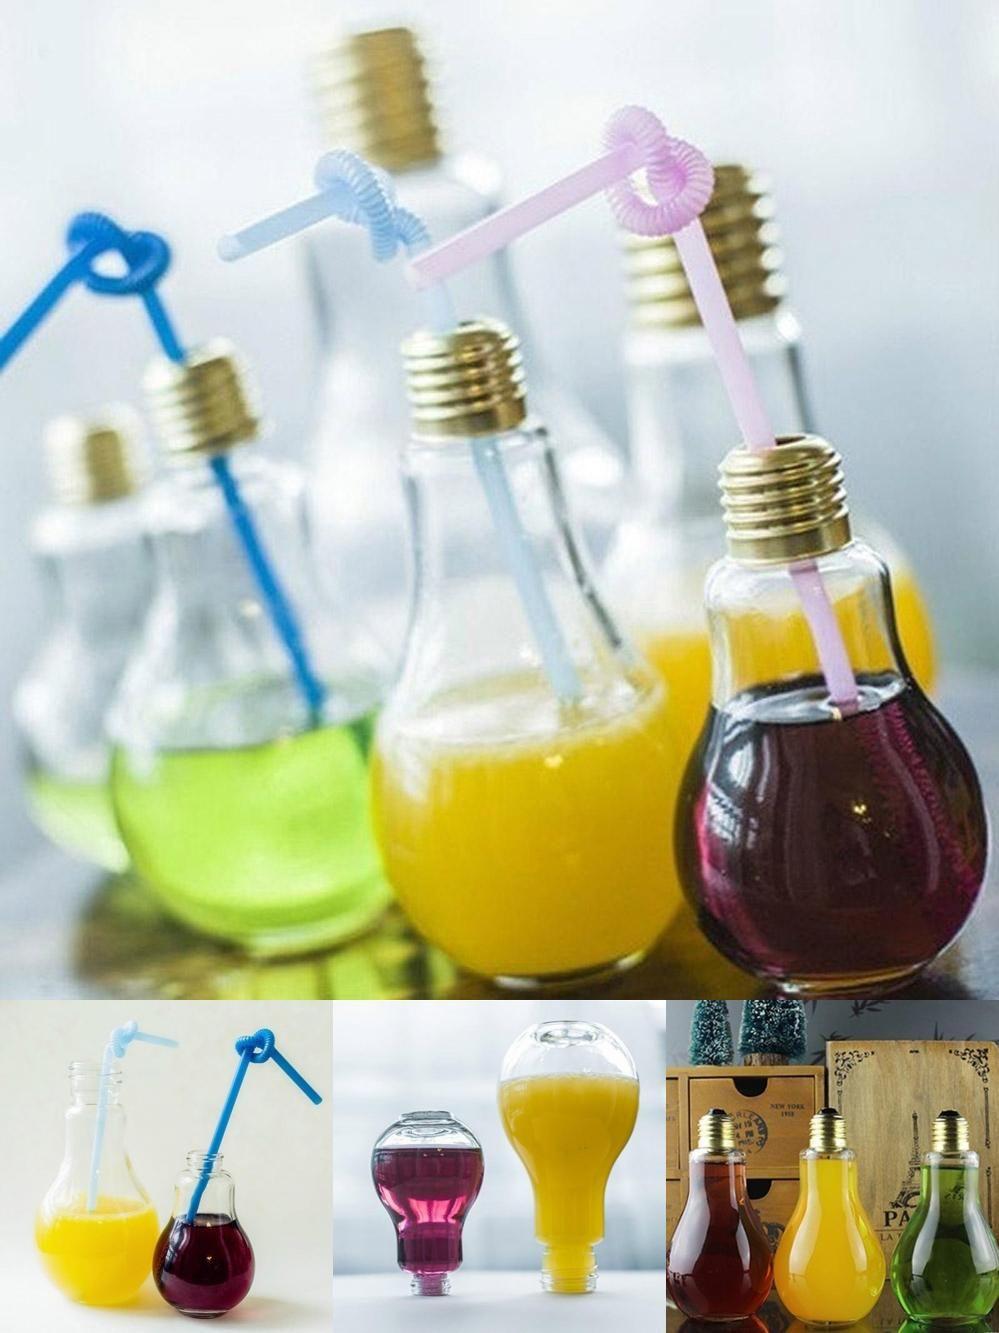 Visit to Buy] Light Bulb Beverage Milky Tea Fruit Juice Drink Bottle ... for Lamp Bottle Juice  166kxo